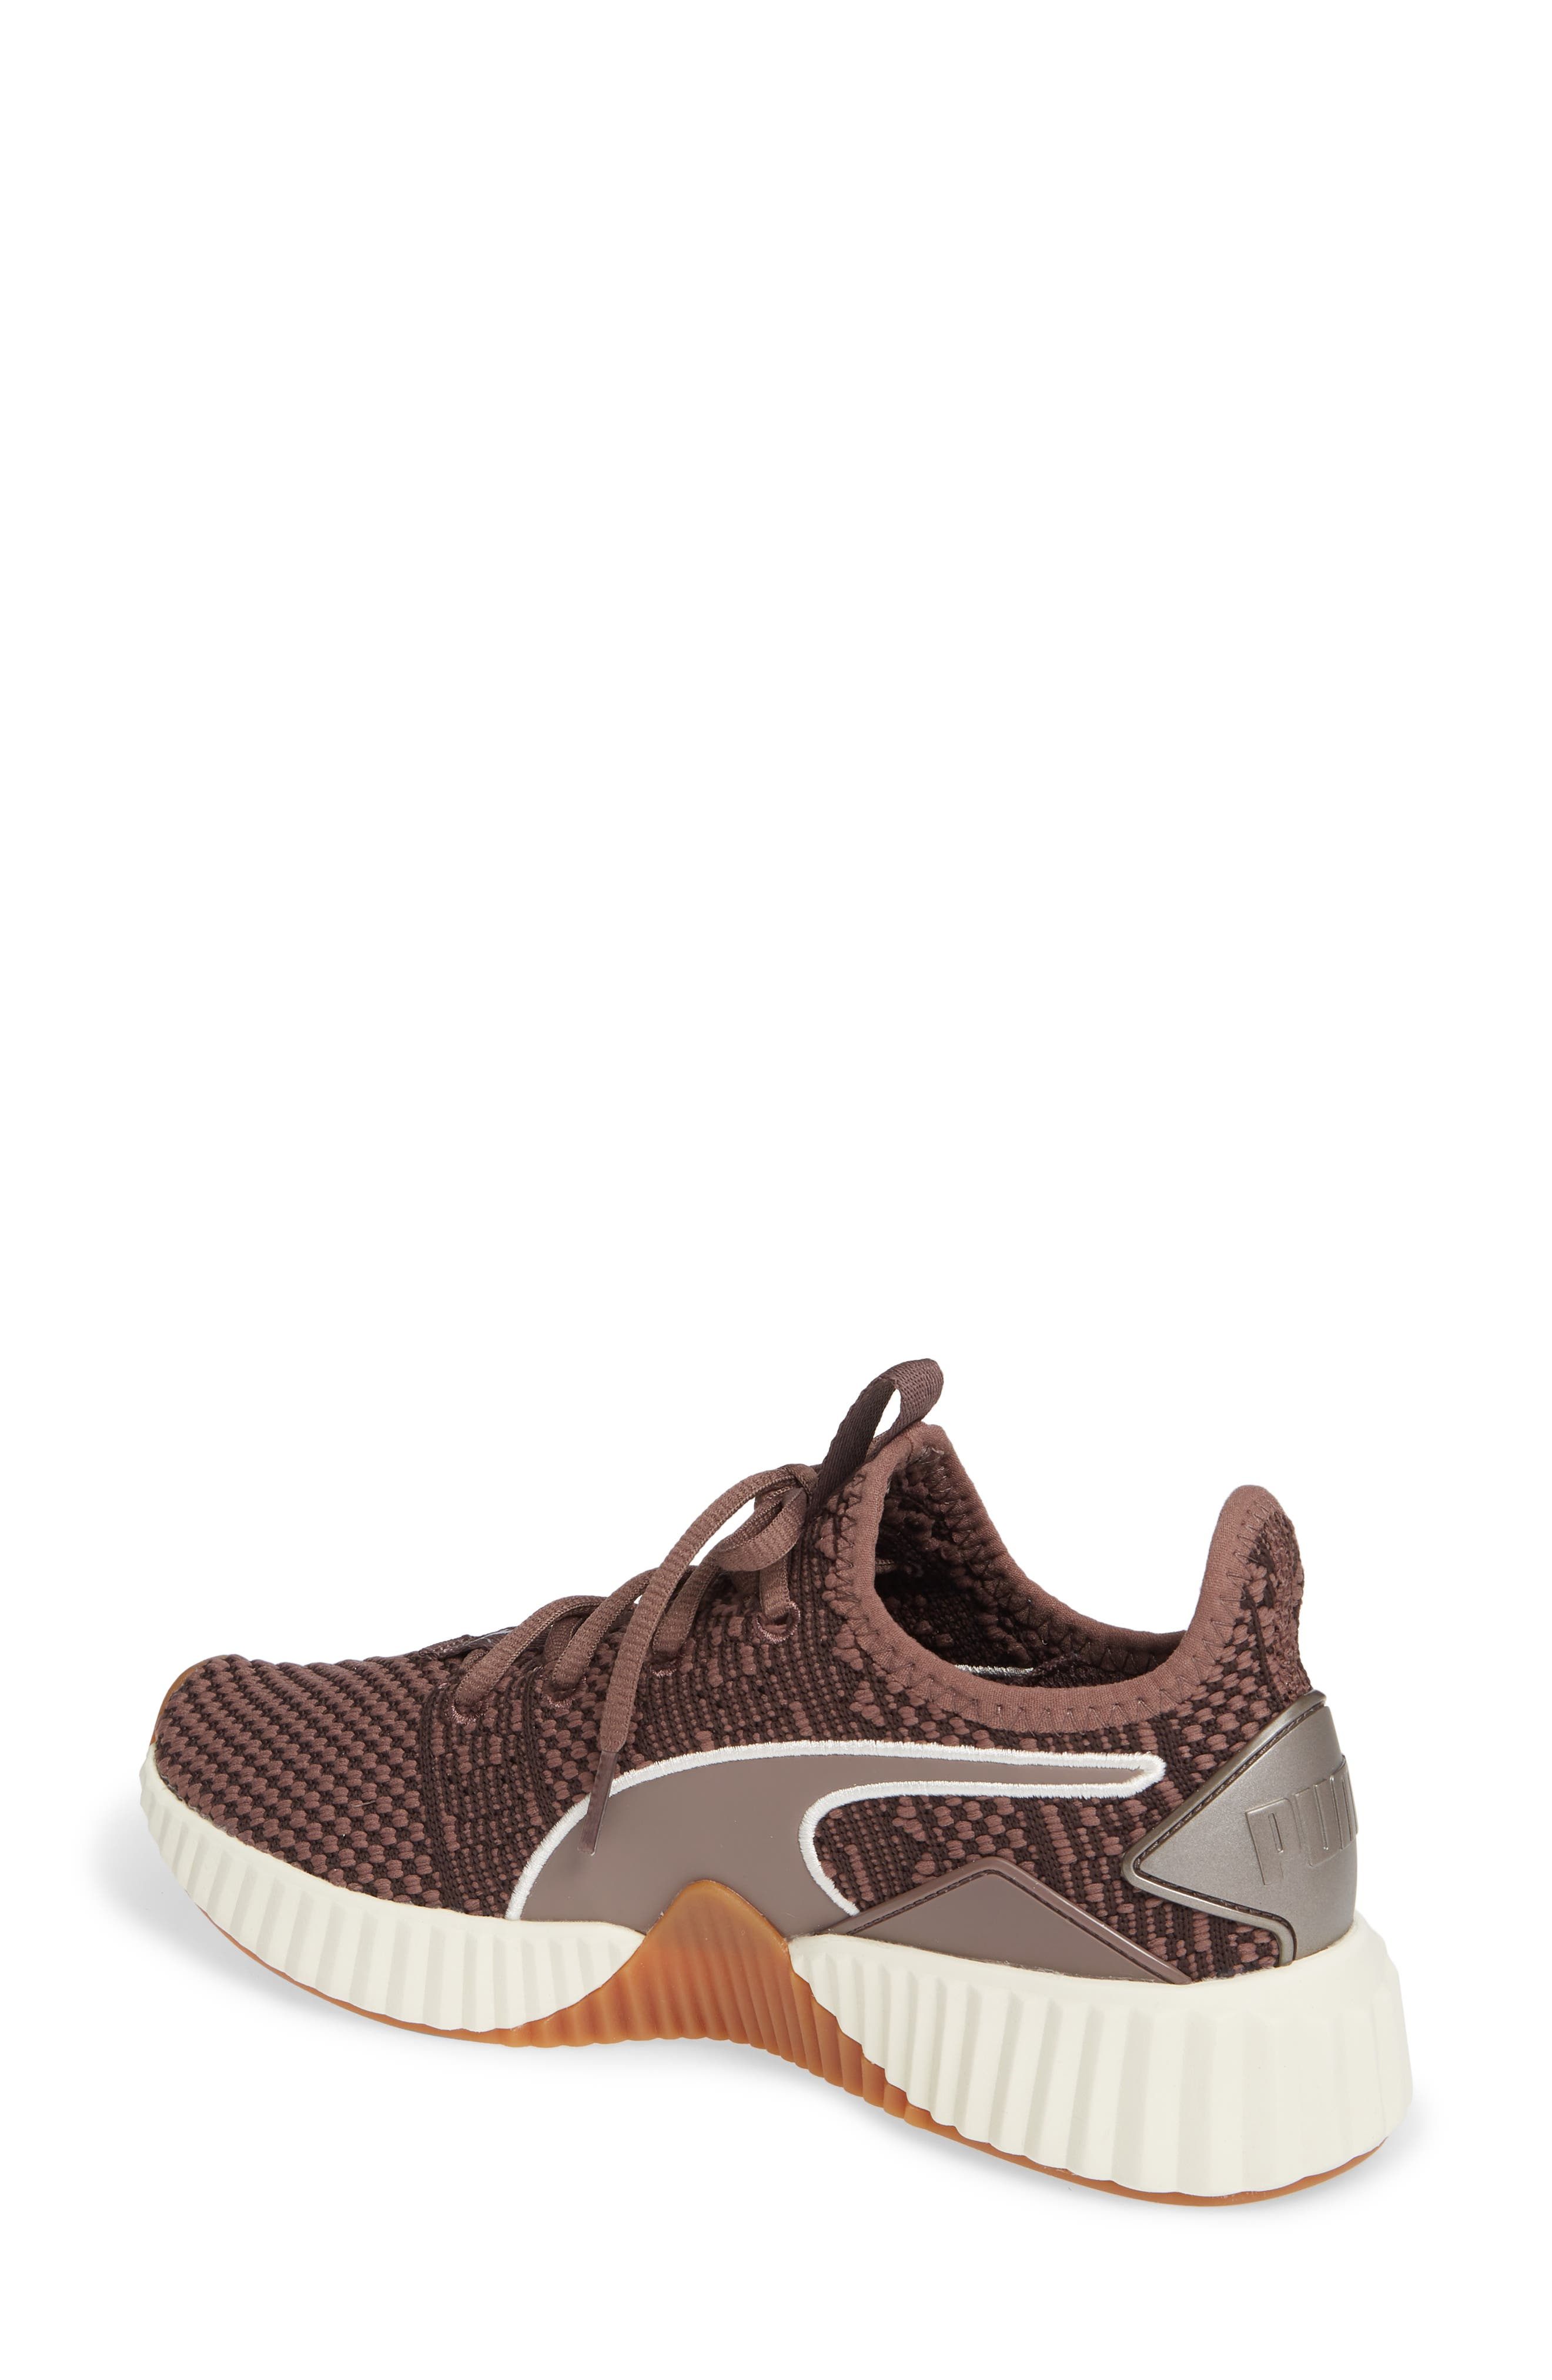 PUMA, Defy Luxe Sneaker, Alternate thumbnail 2, color, PEPPERCORN/ METALLIC ASH